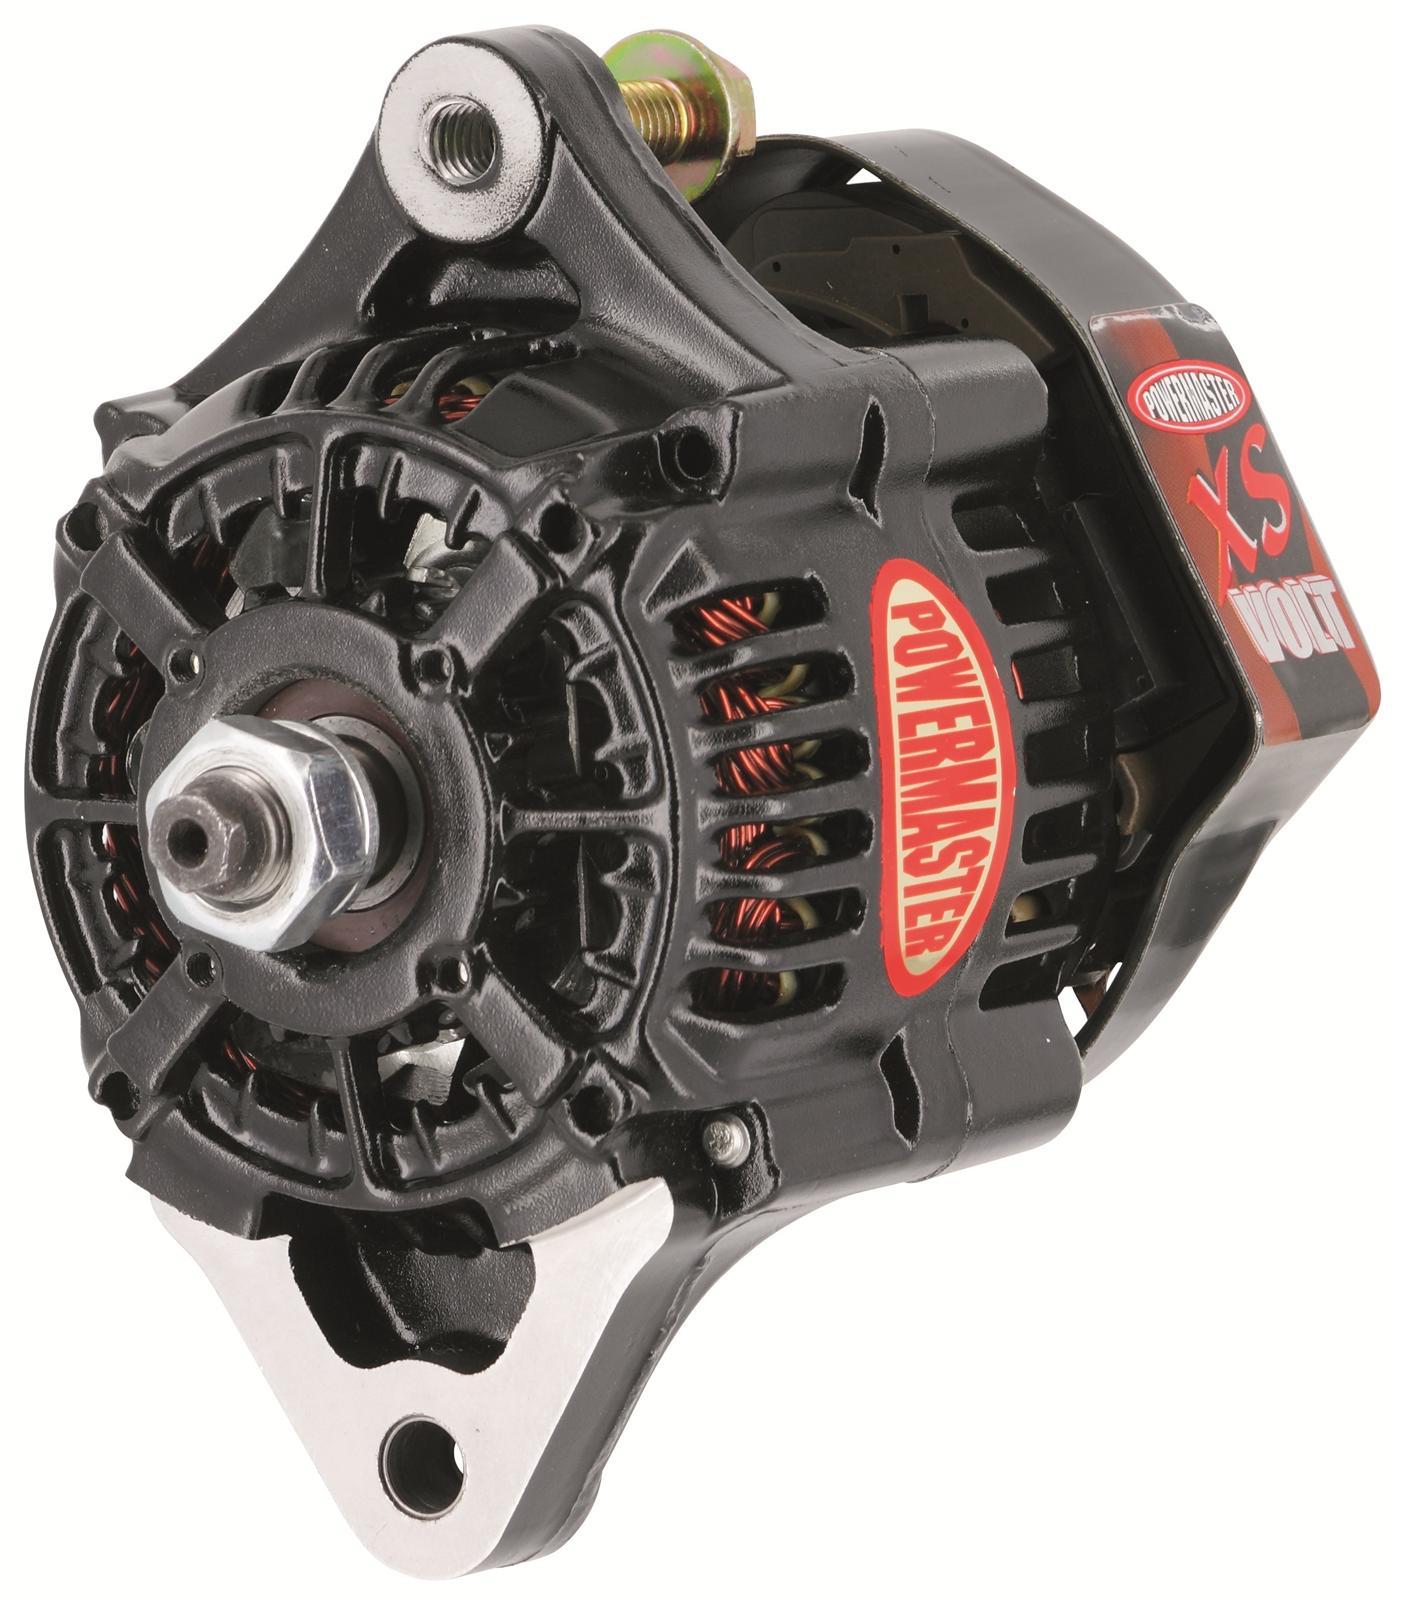 Powermaster alternator wiring harness adapters